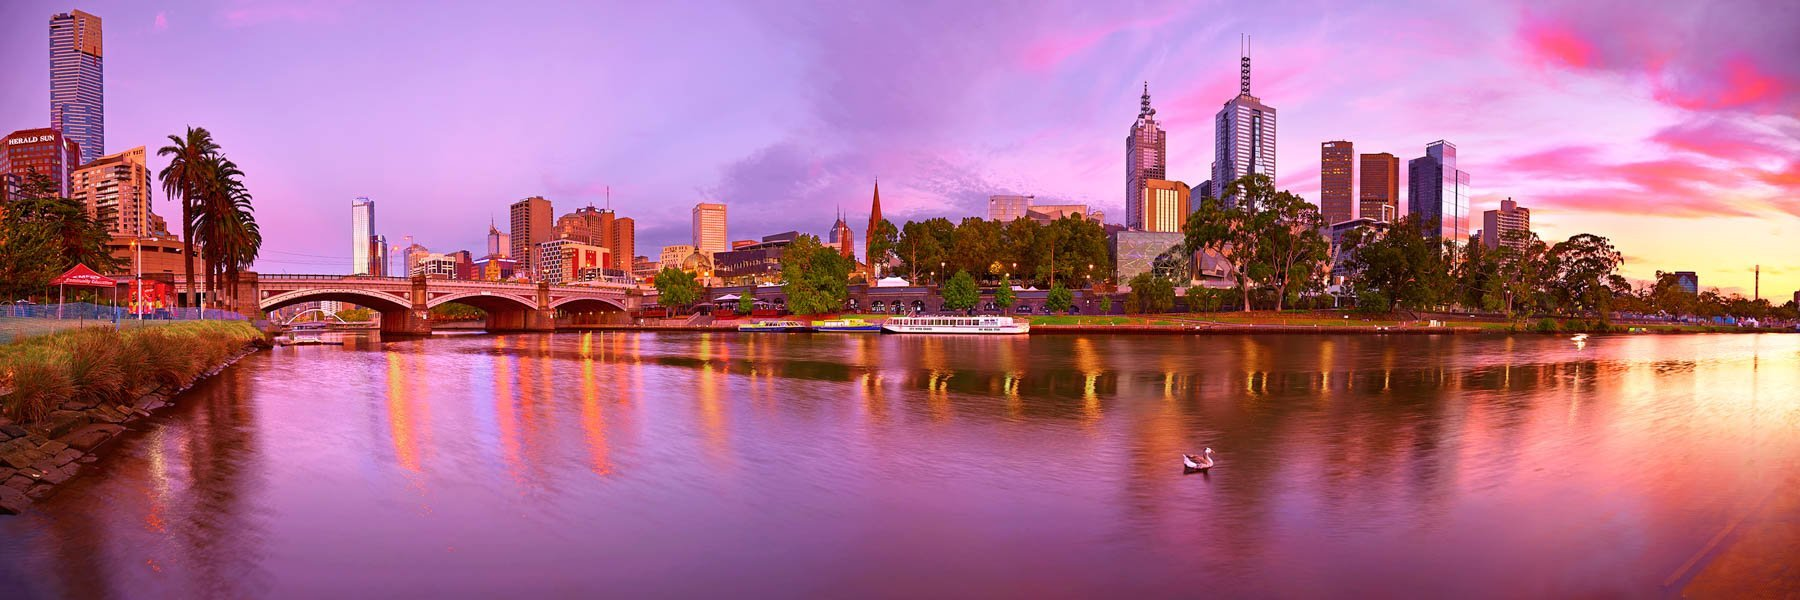 A rich pastel sunrise over the city of Melbourne, Australia.